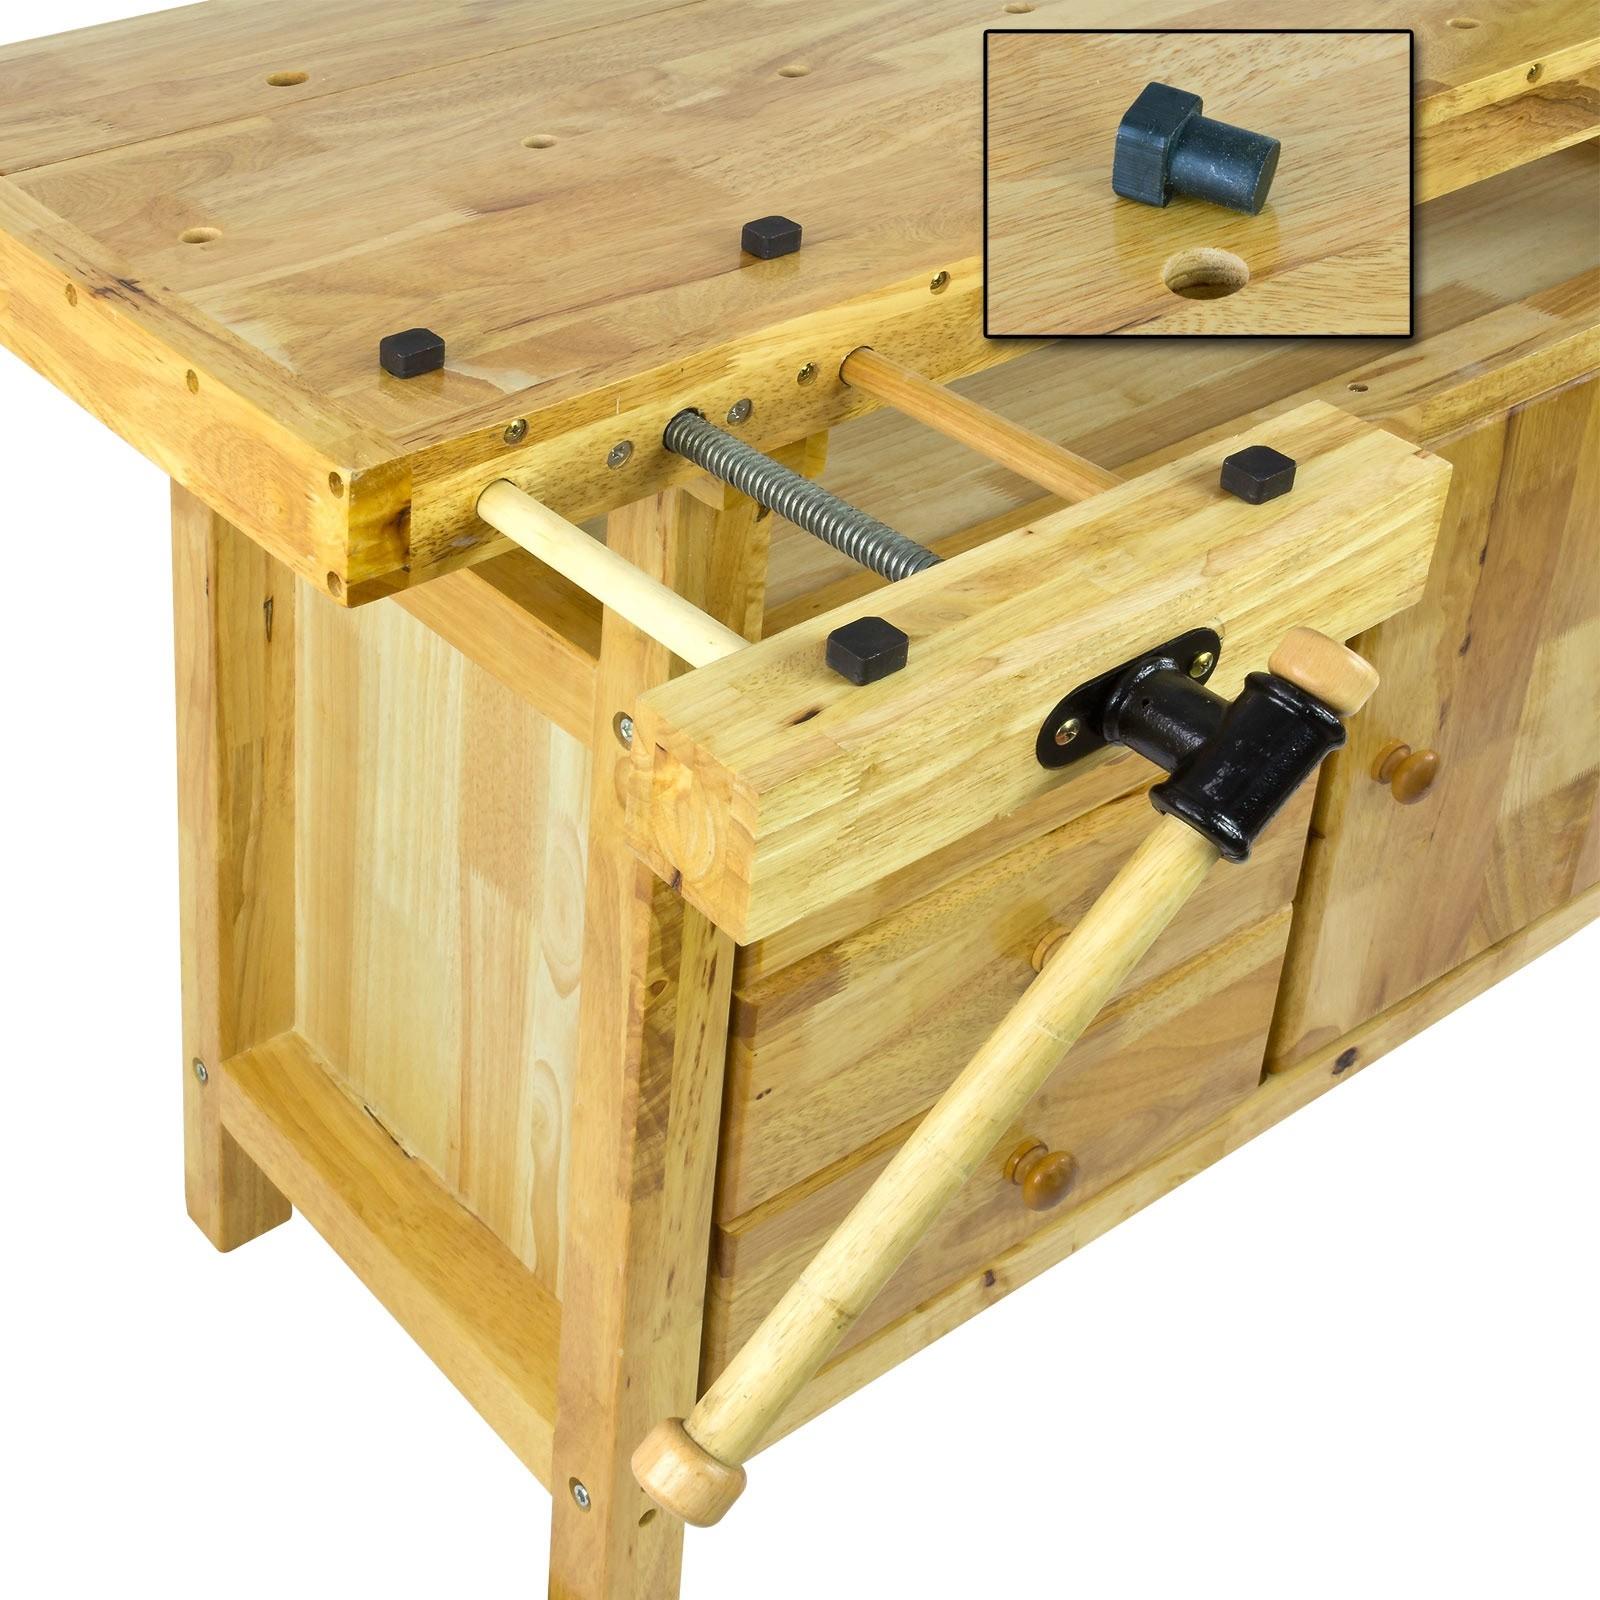 holz lagerregal great woltu rgbntc lagerregal standregal regale fr bcher ebenen mehr raum. Black Bedroom Furniture Sets. Home Design Ideas